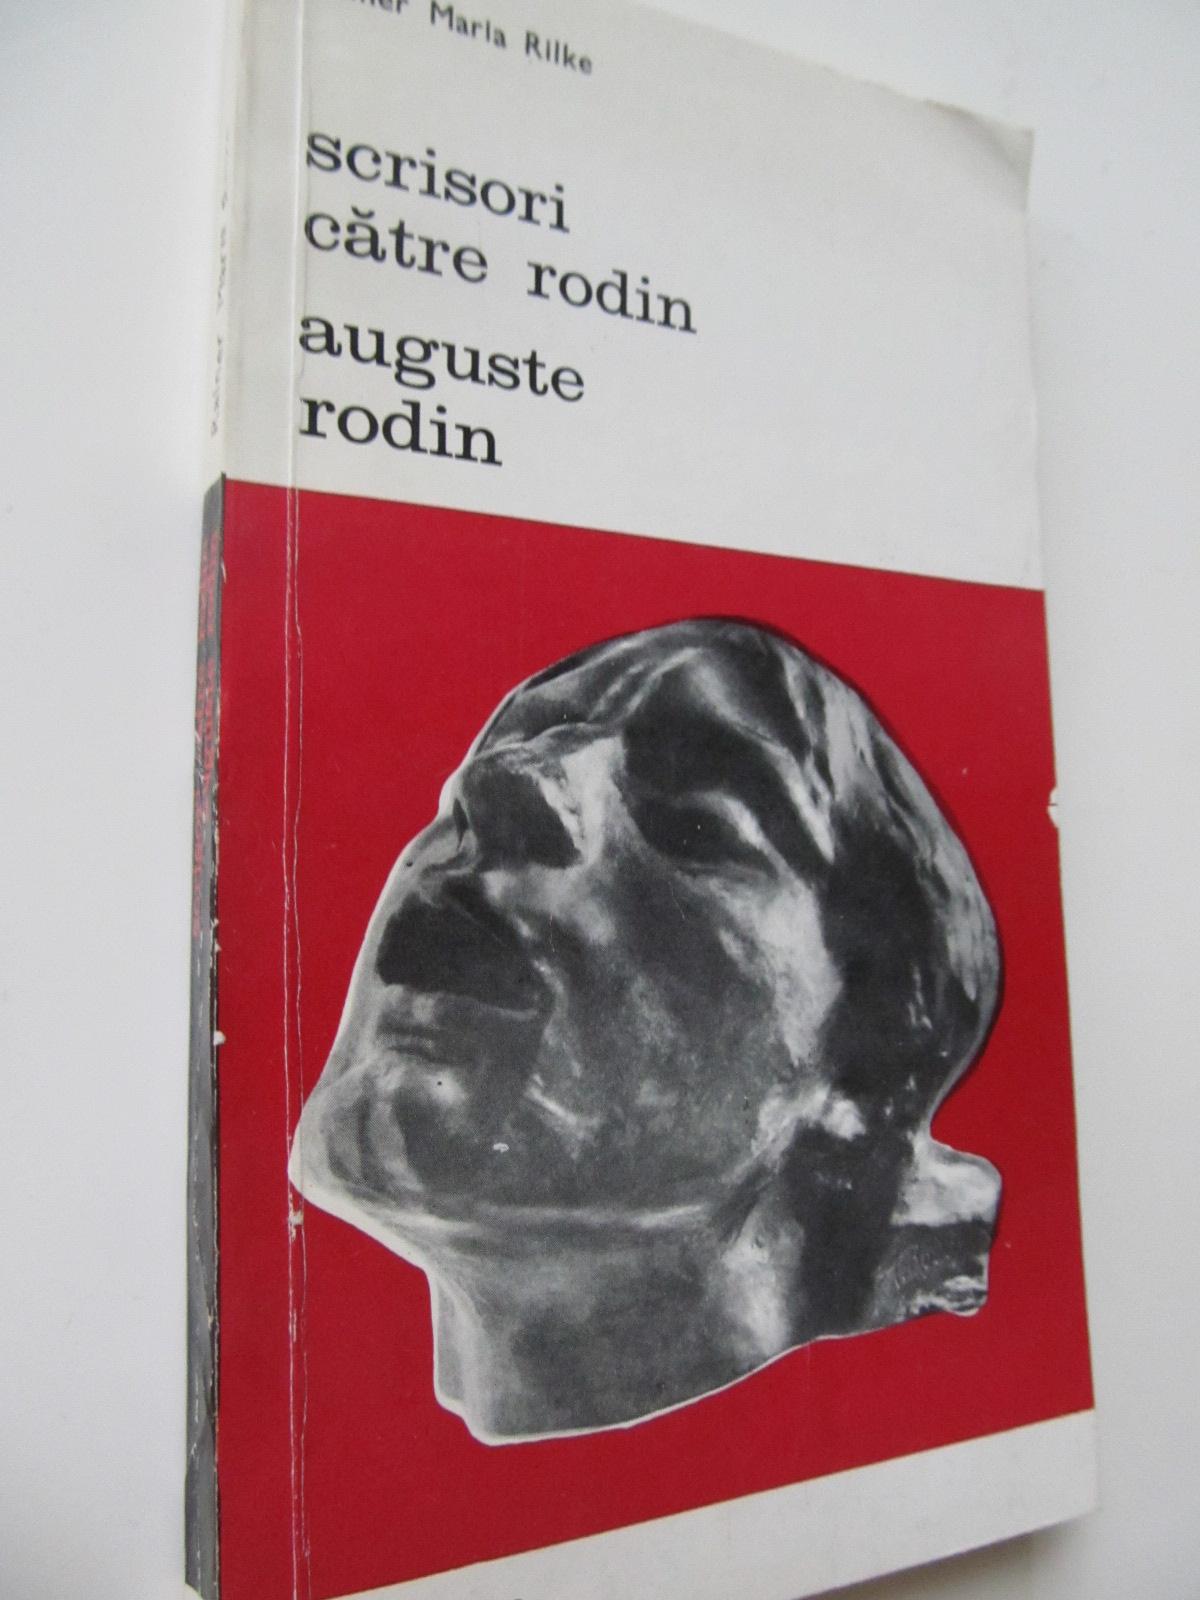 Scrisori catre Rodin Auguste Rodin - Rainer Maria Rilke | Detalii carte